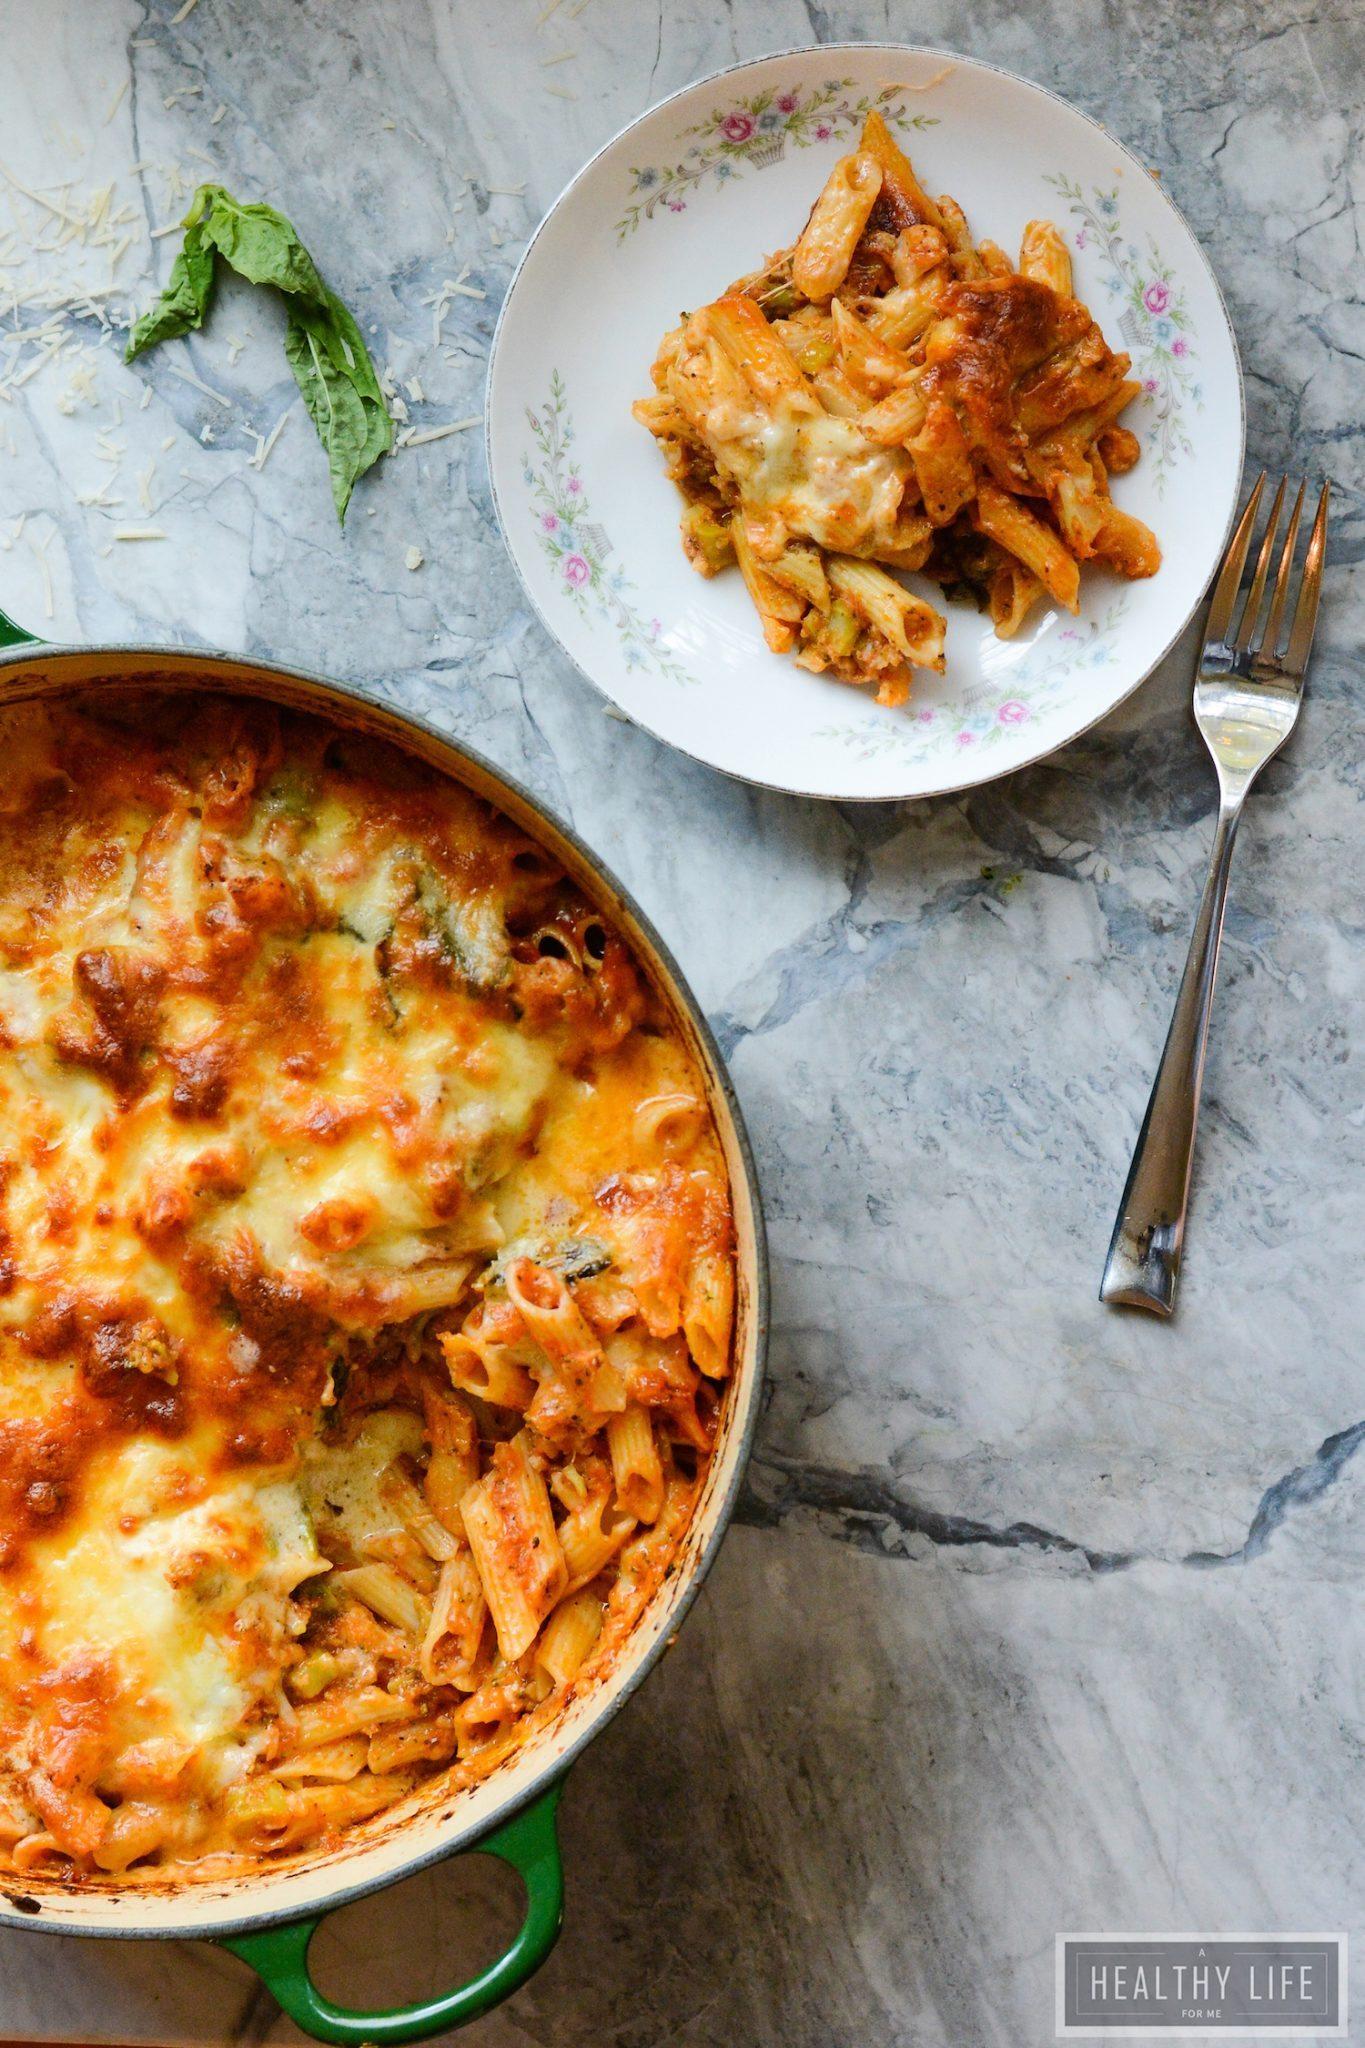 Easy vegetarian meal ideas, healthy dinners, make at home meals - LivingMiVidaLoca.com